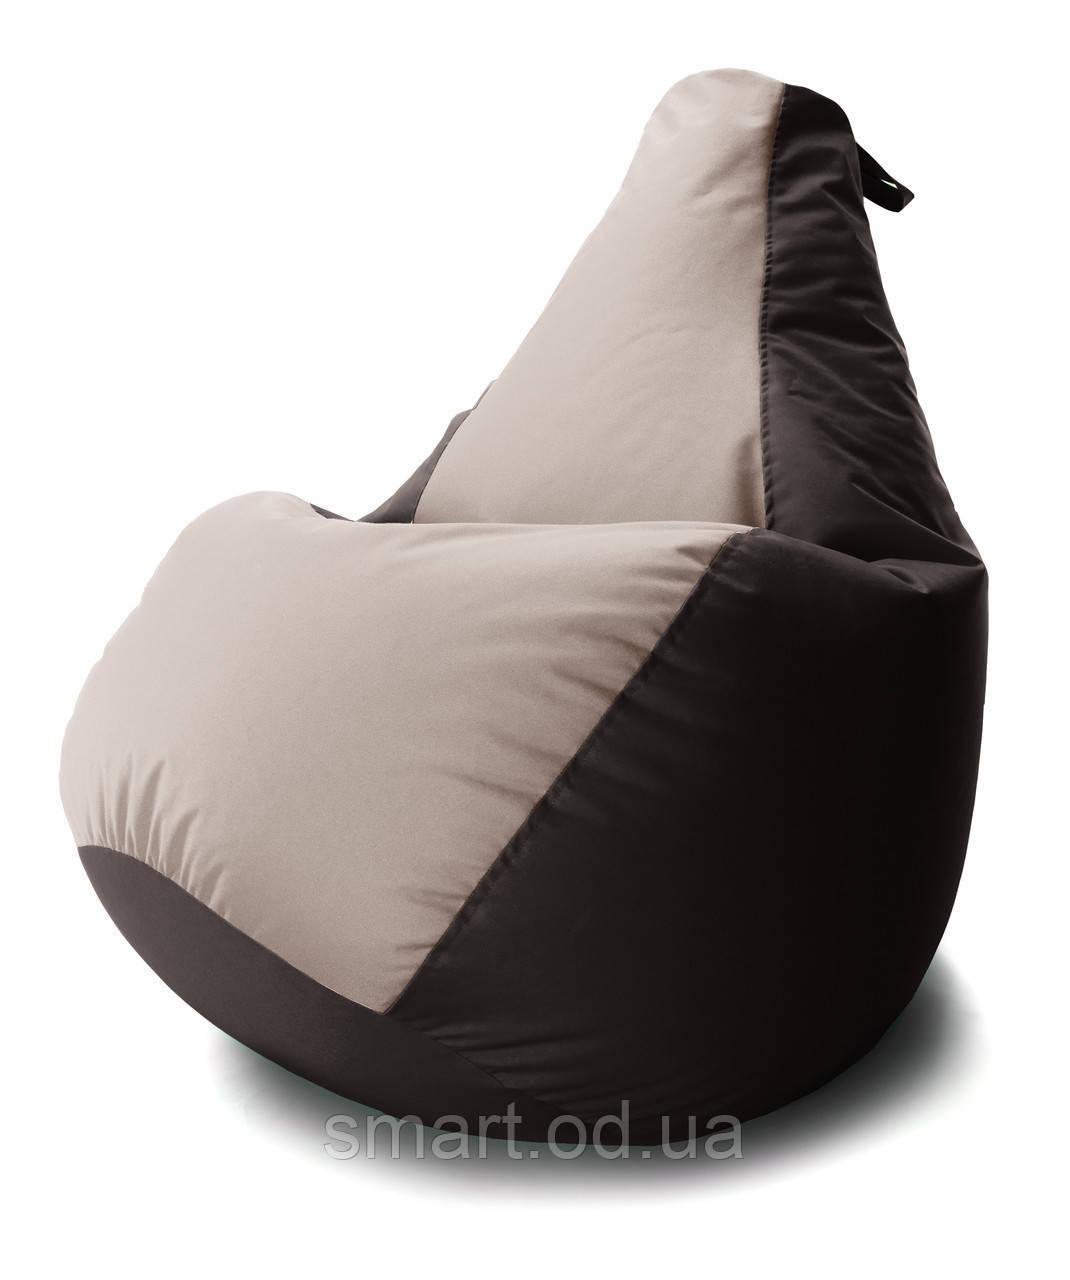 Кресло мешок груша Комби Оксфорд Стронг 100*140  см